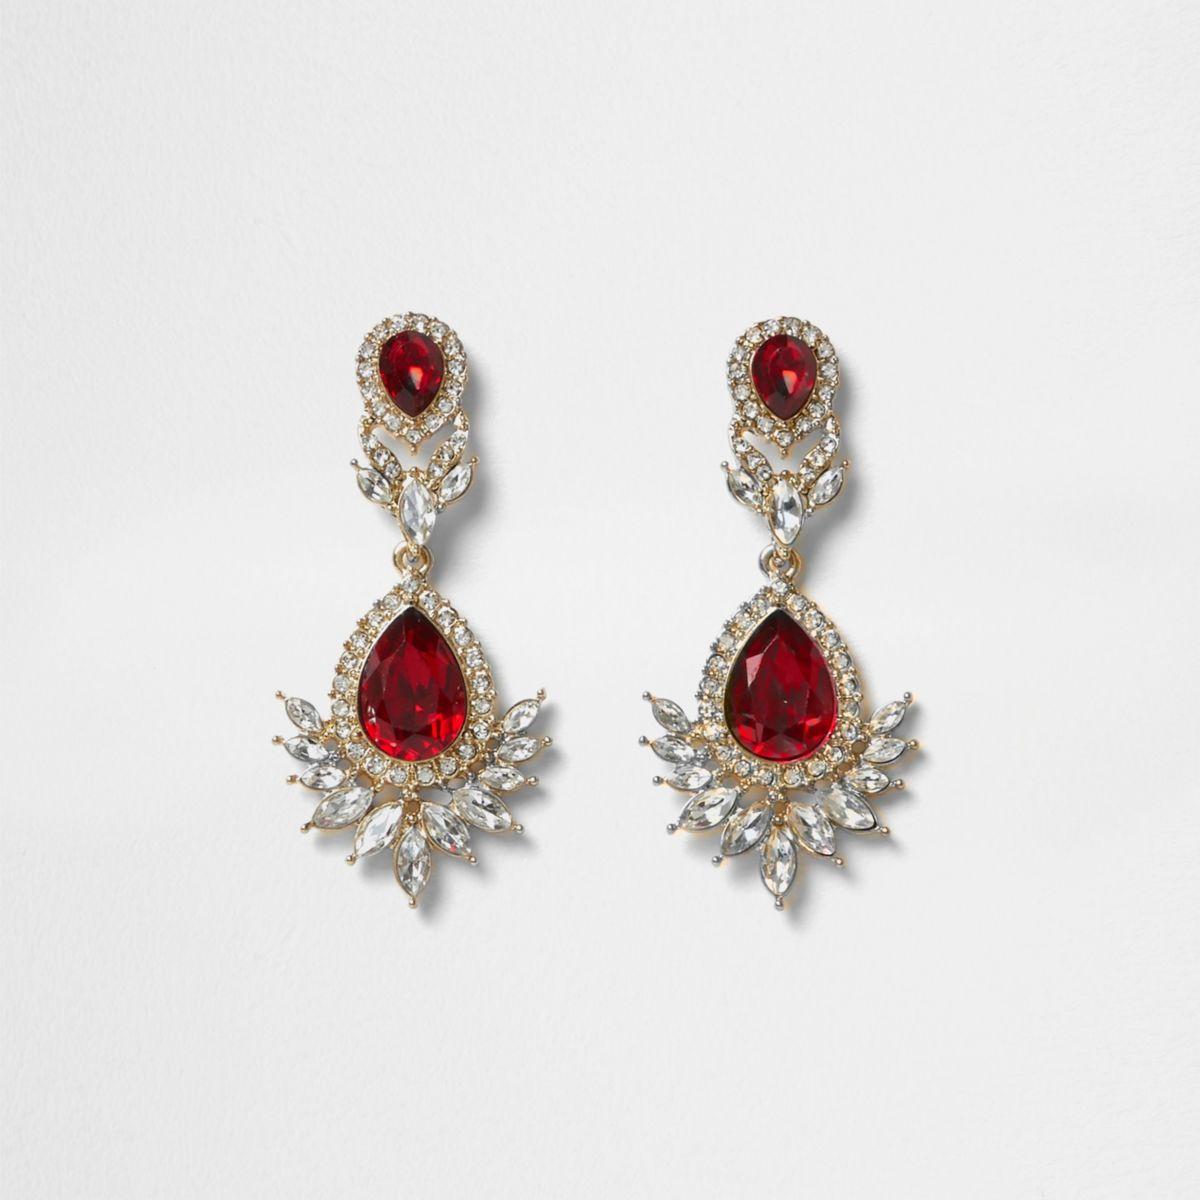 Gold tone red gem drop earrings